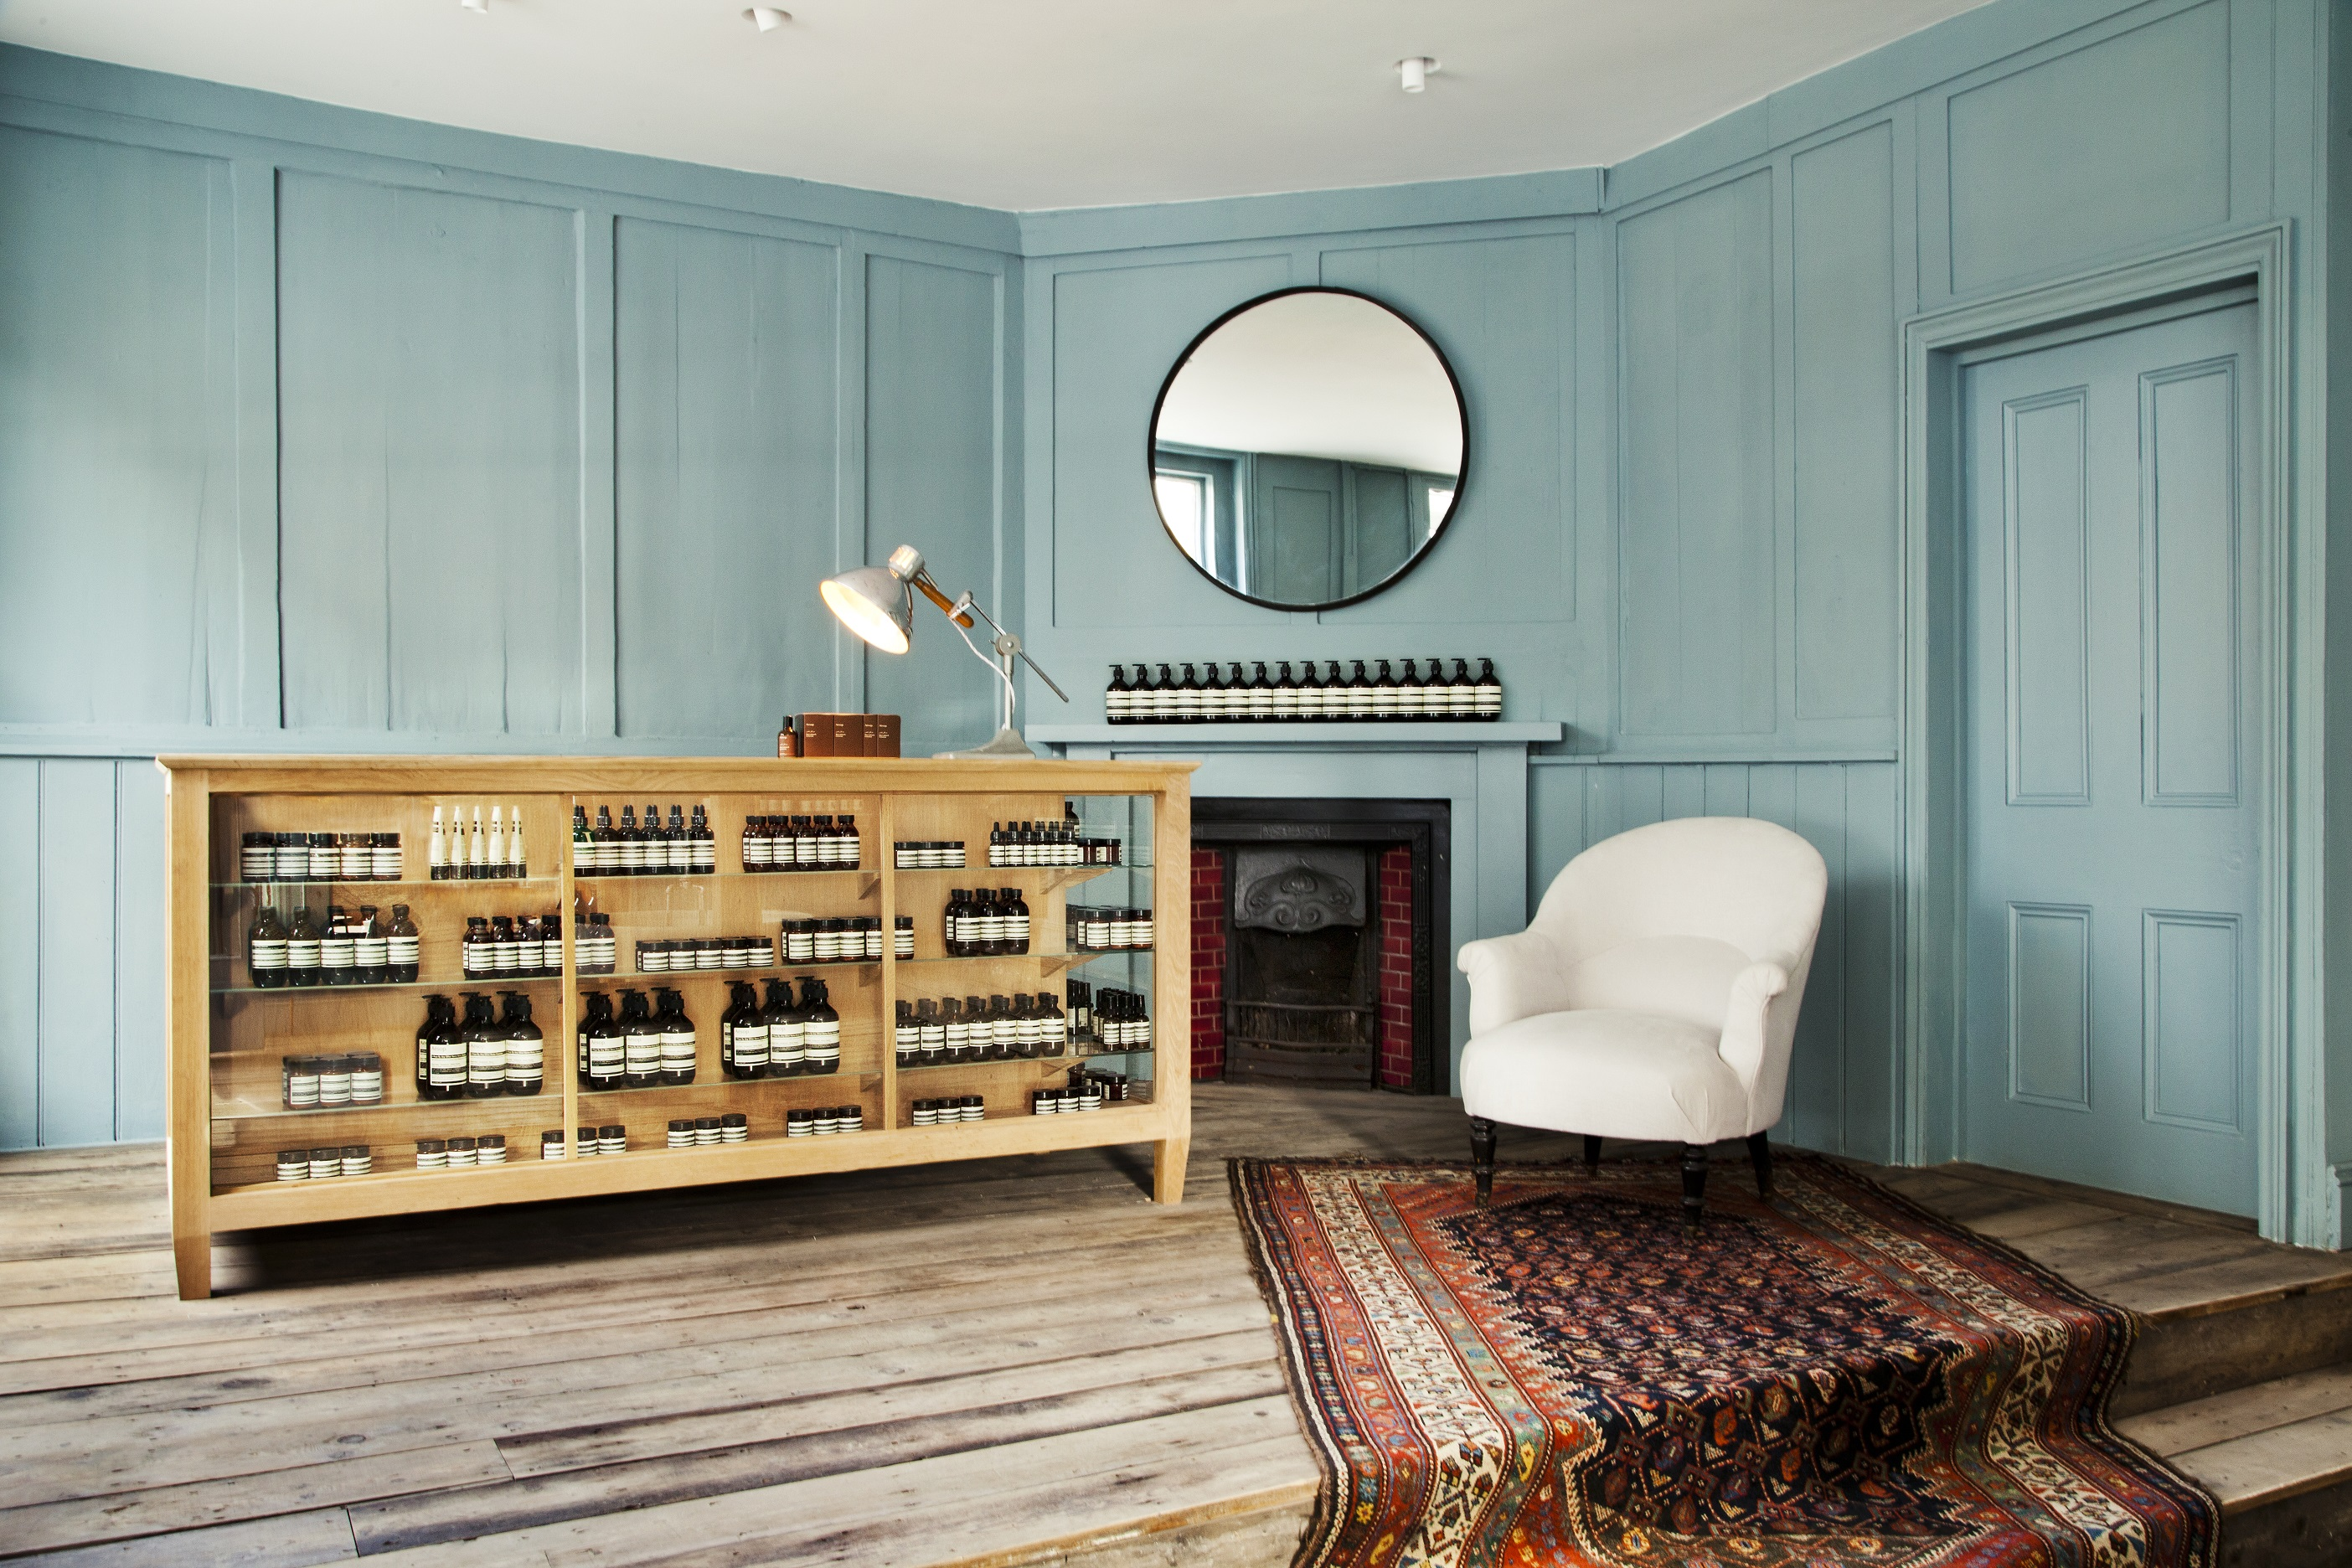 Partners Desk Craigslist 100 Office Furniture Cubicle